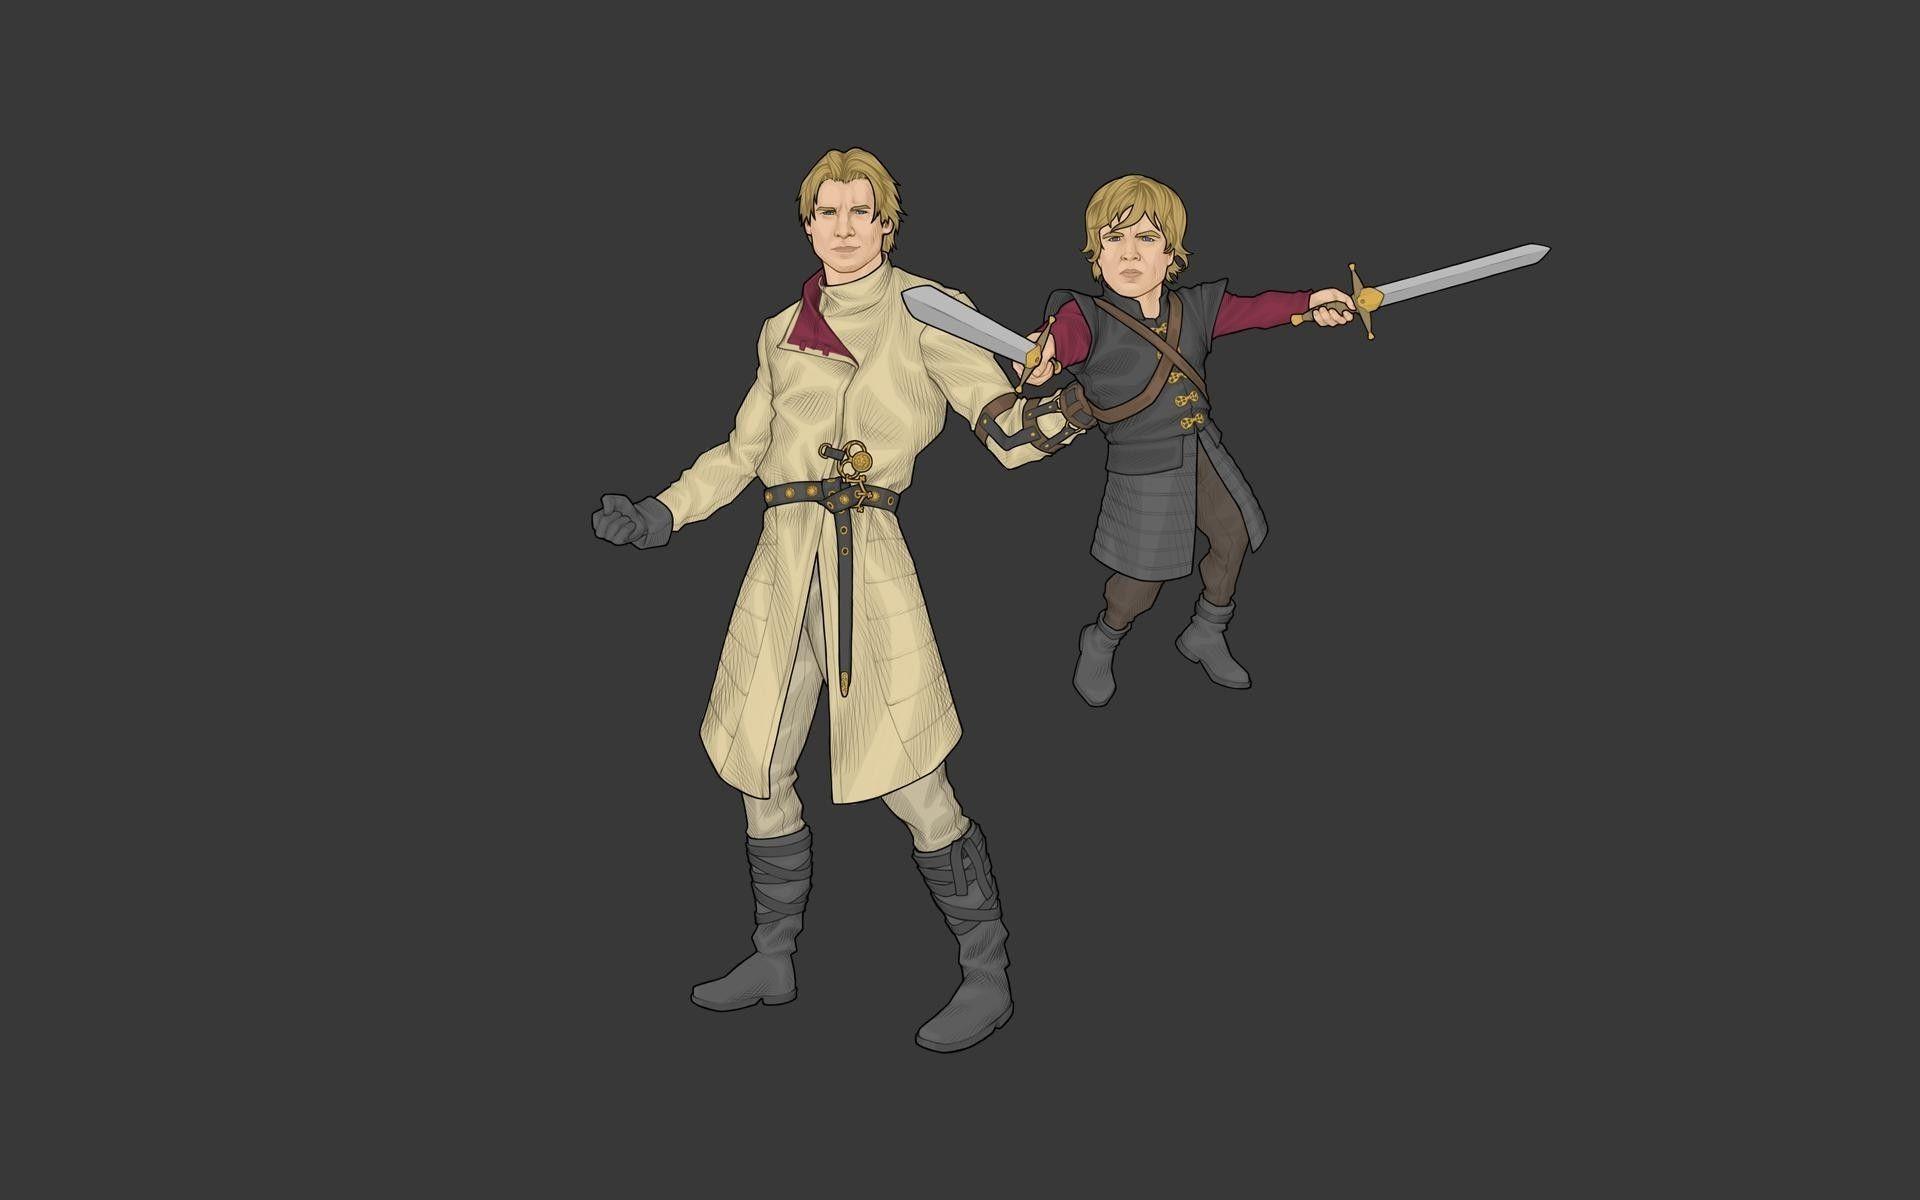 … Lannister always pays his debts; Game of Thrones